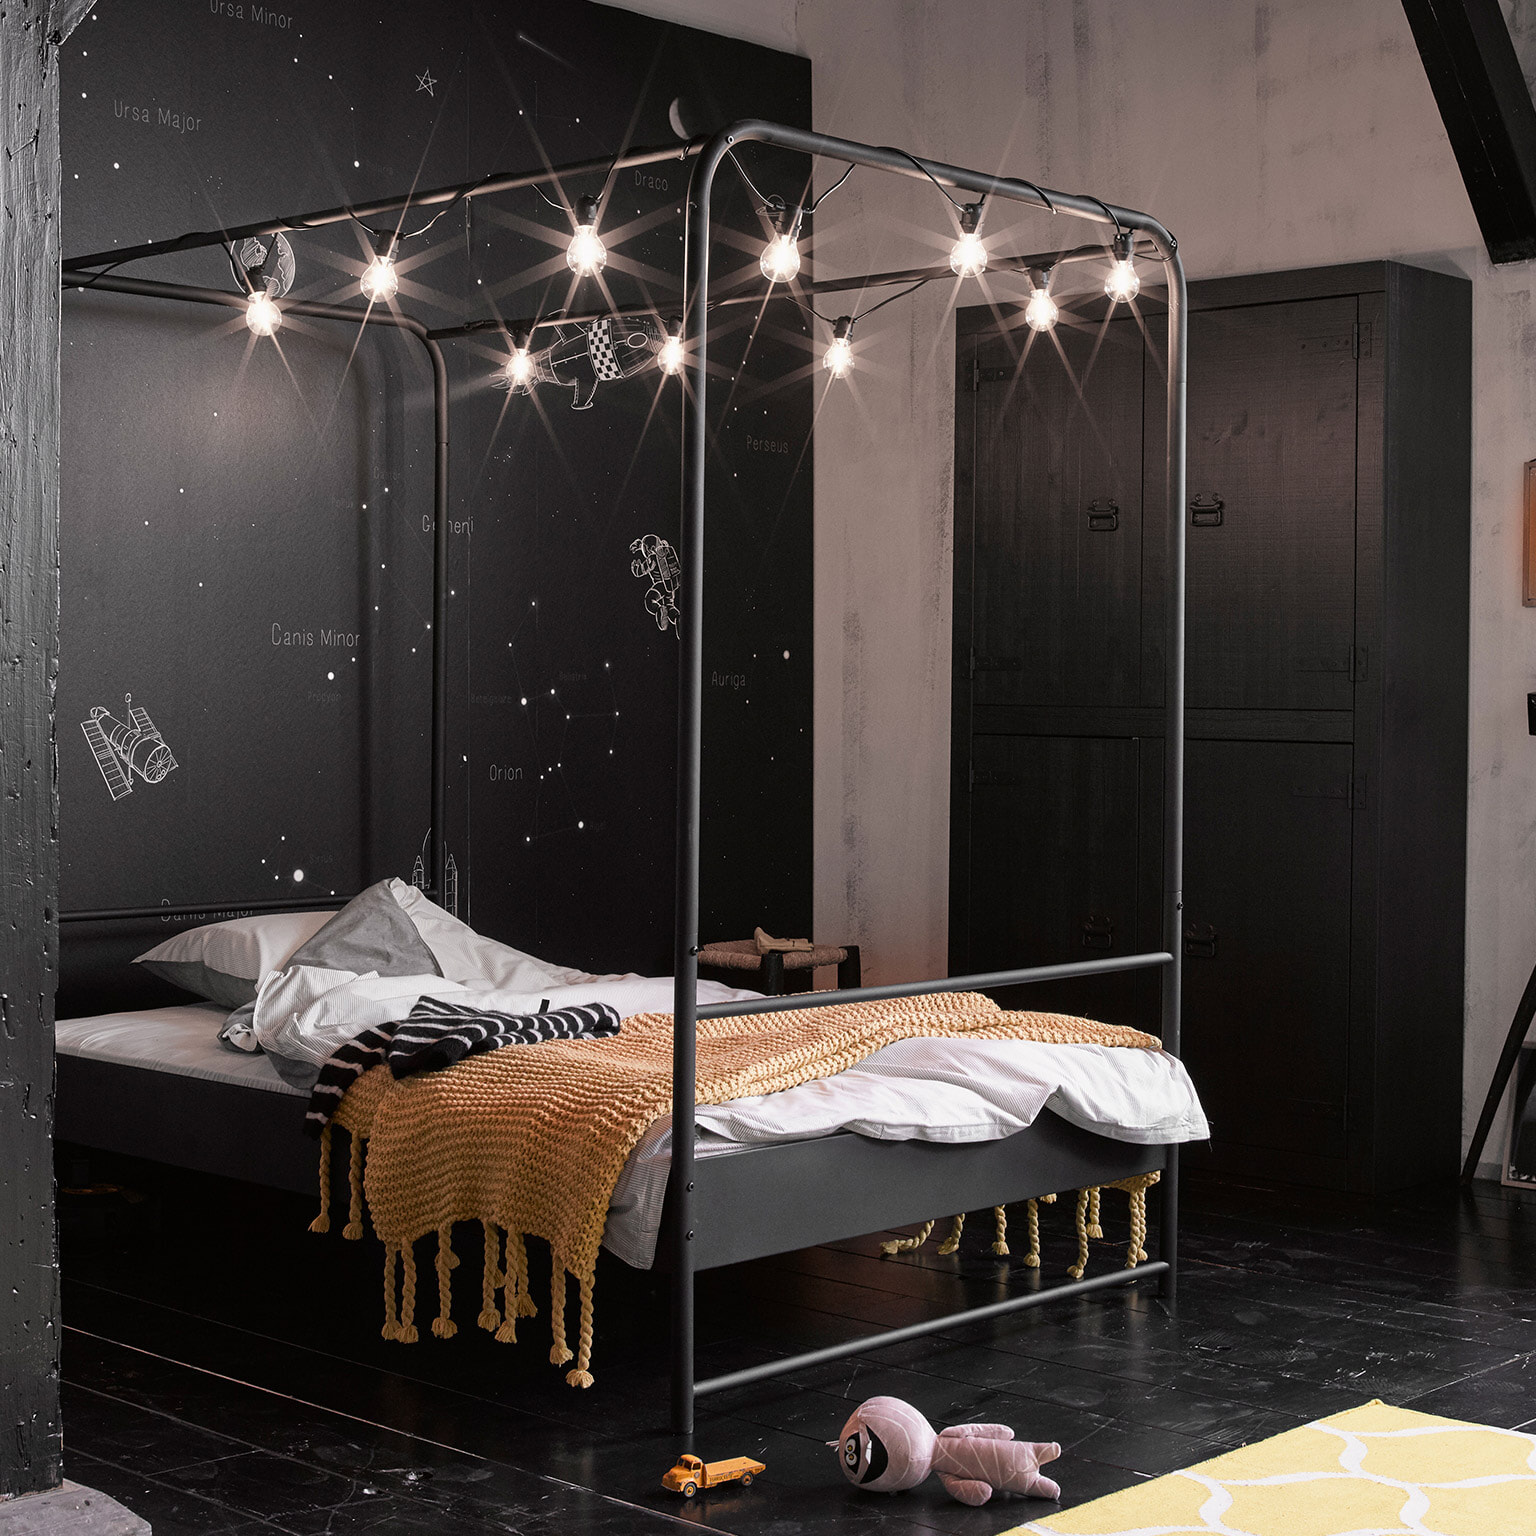 vtwonen Hemelbed 'Bunk' 120 x 200cm, kleur Zwart